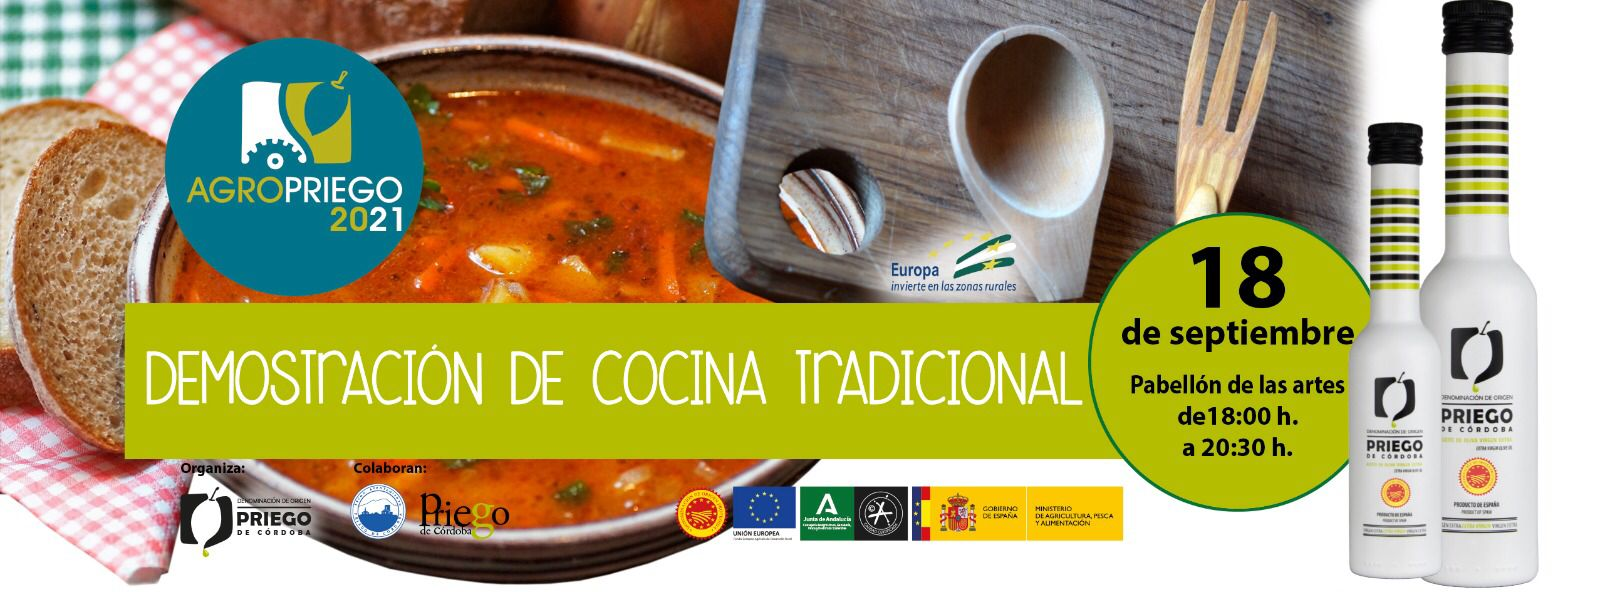 Demostración de Cocina Tradicional Agropriego 2021 - DOP Priego de Córdoba